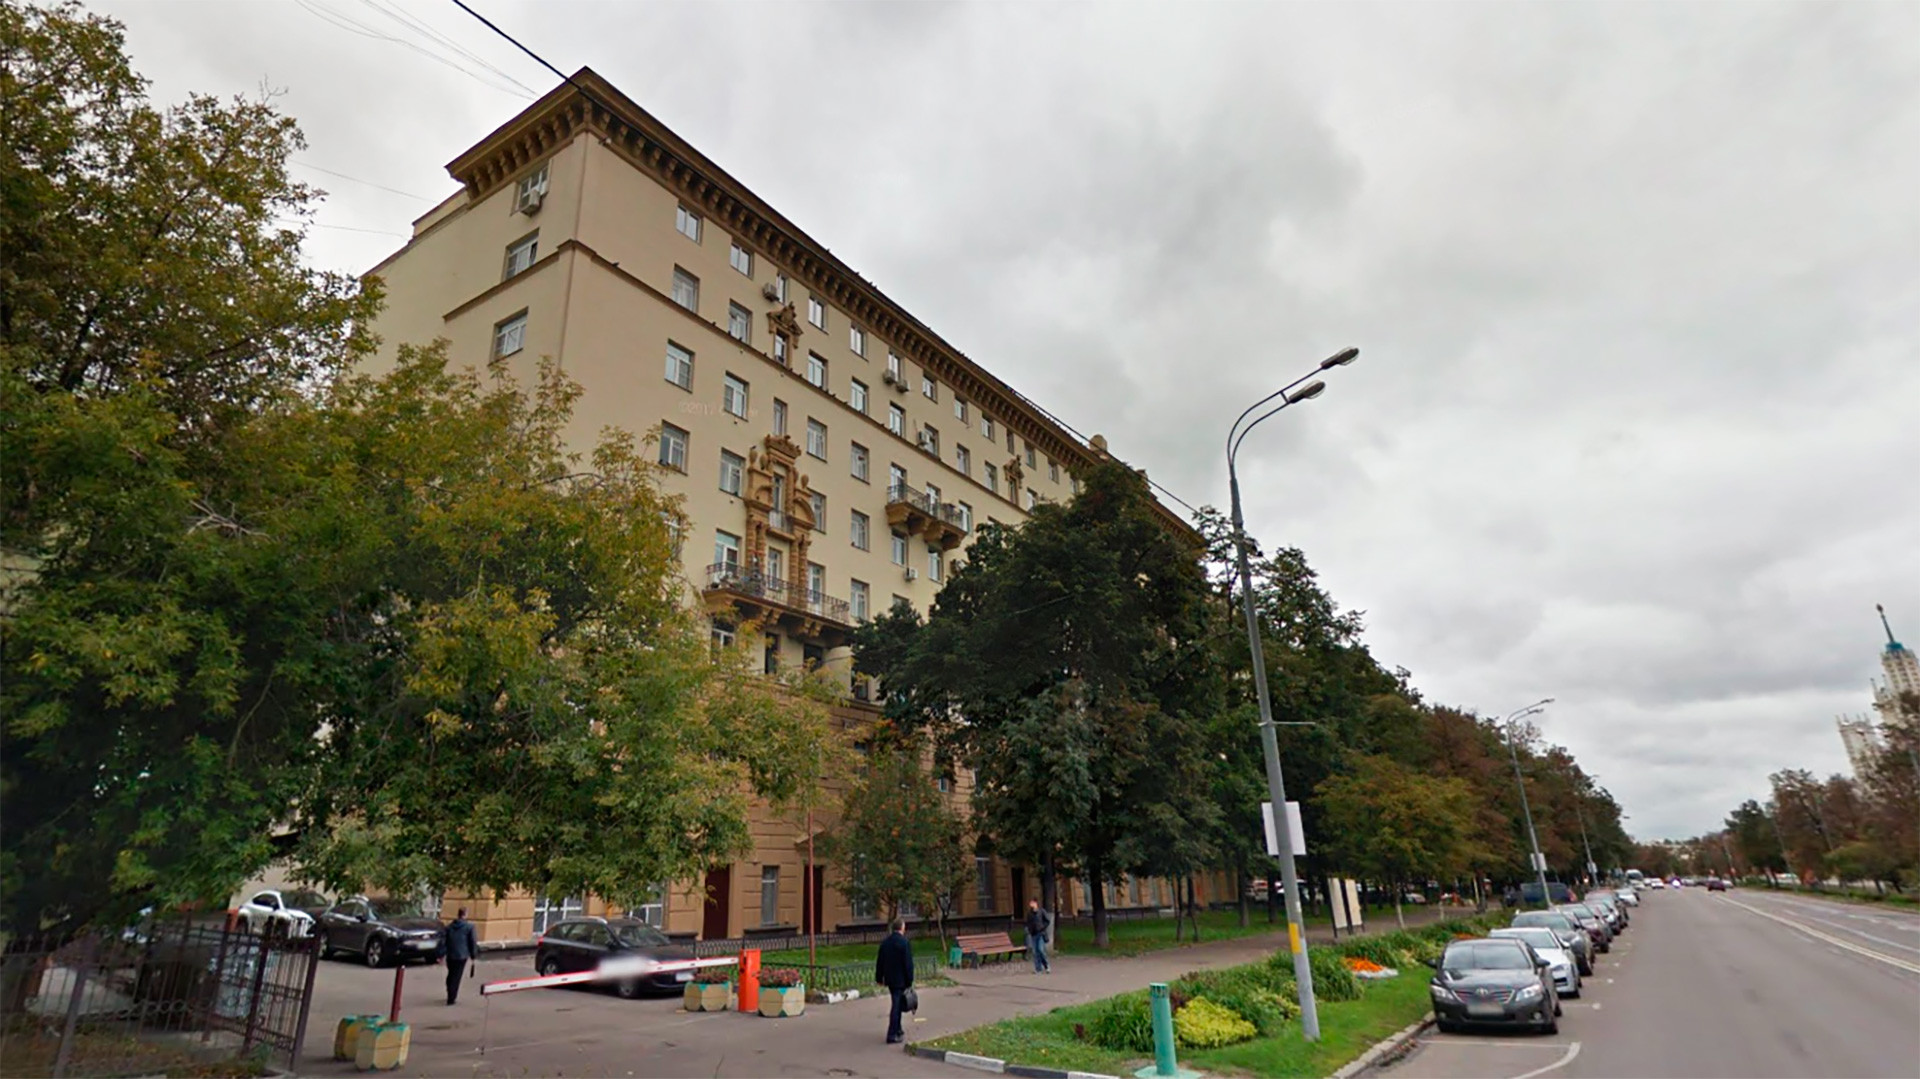 Kosmodamianskaya Embankment, 36.